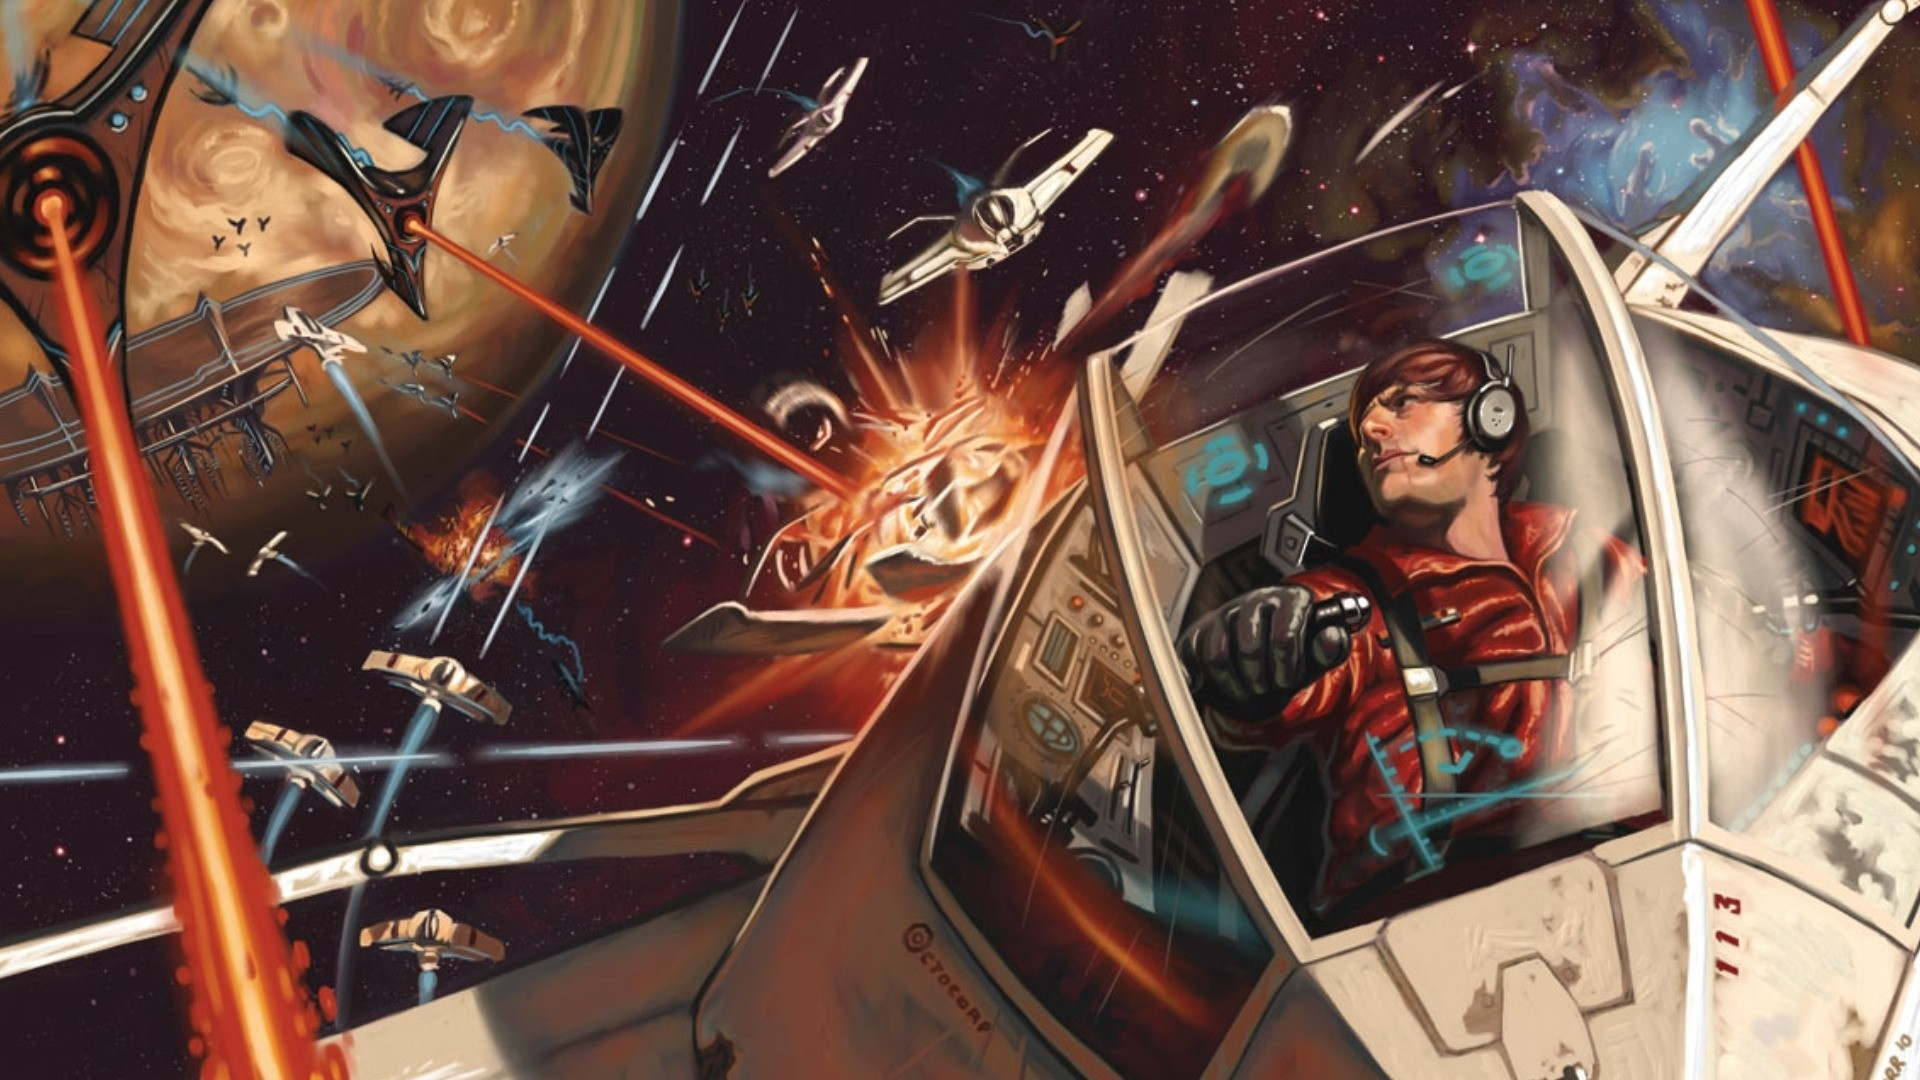 Fantasy art Abstract battle space spaceship wallpaper .